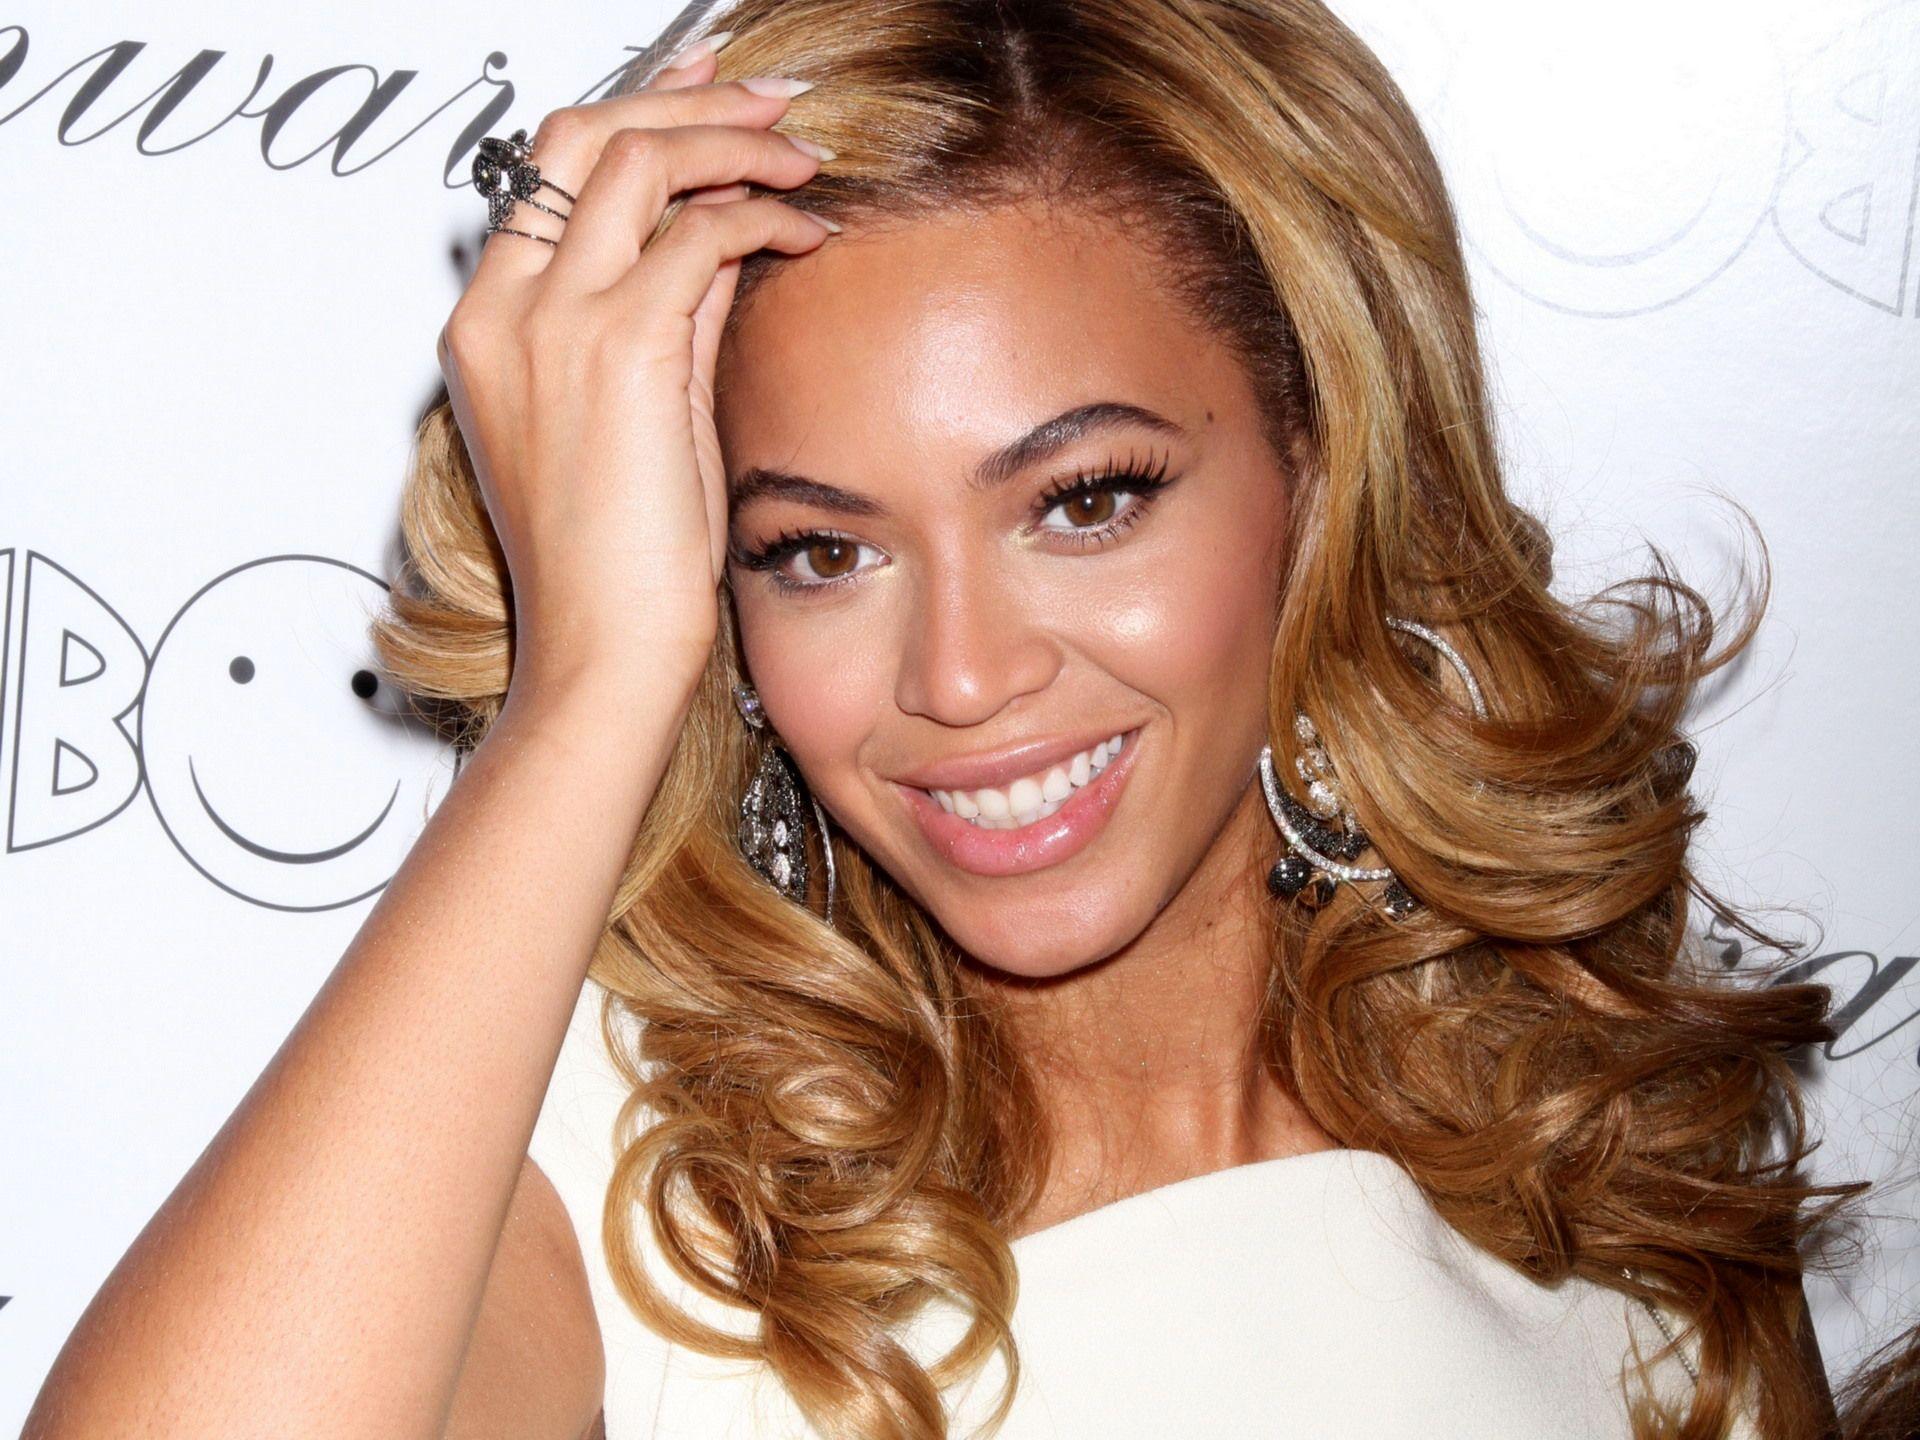 Beyonce Without Makeup 2013